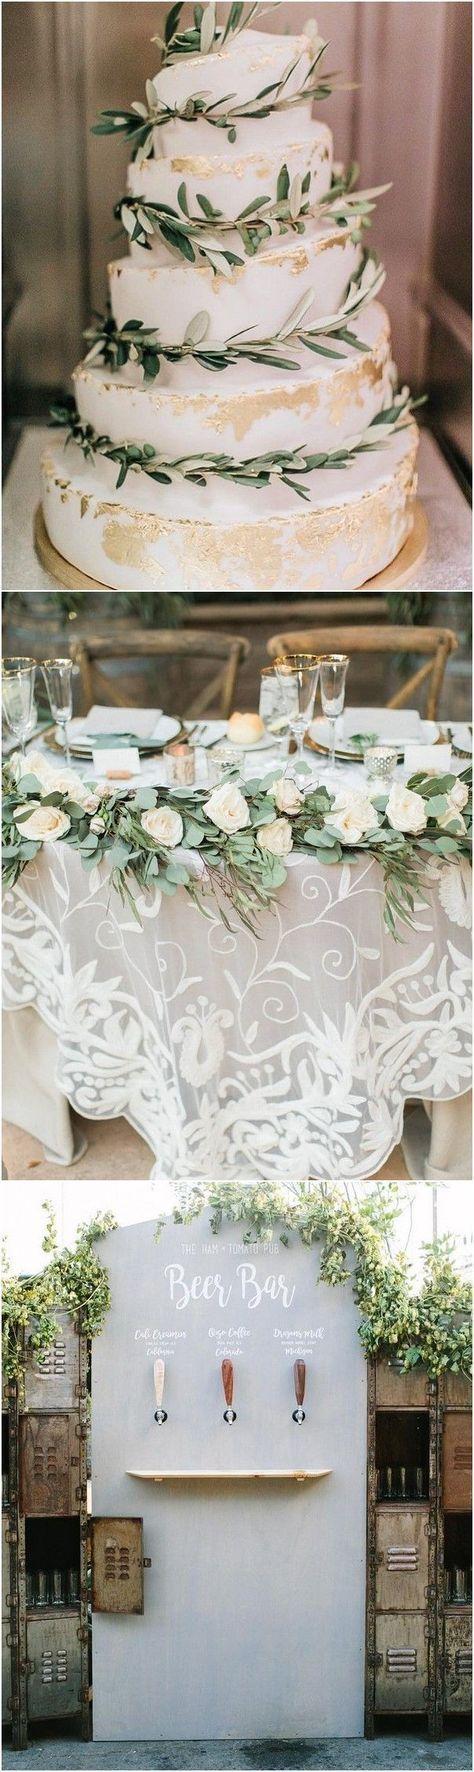 Greenery wedding decor ideas #wedding #weddings #weddingideas #deerpearlflowers …